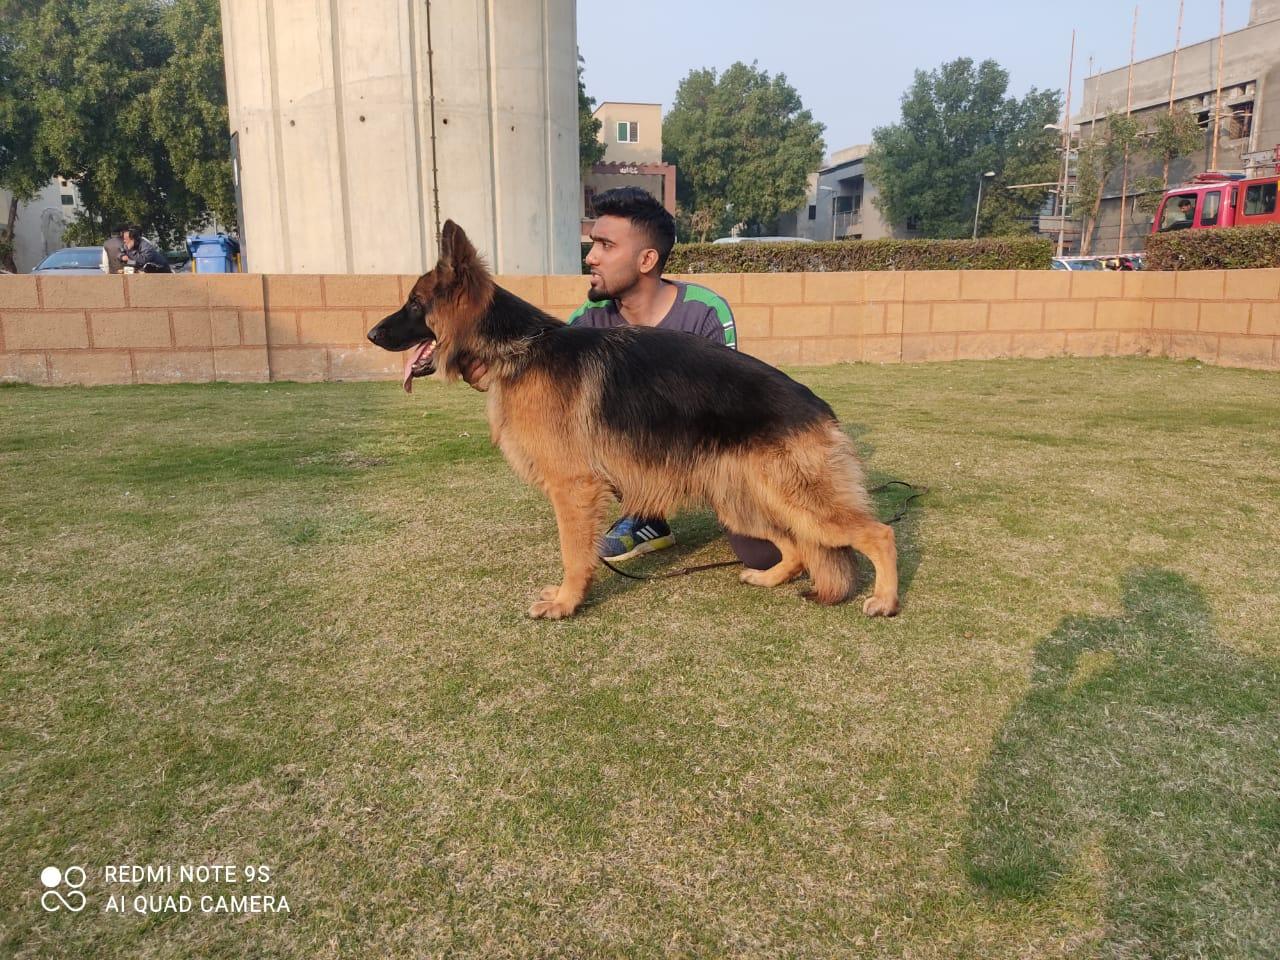 public/dog_images/12500/1618656356.09B29306-E75D-4588-A05A-8FEF63A65DA4.jpeg